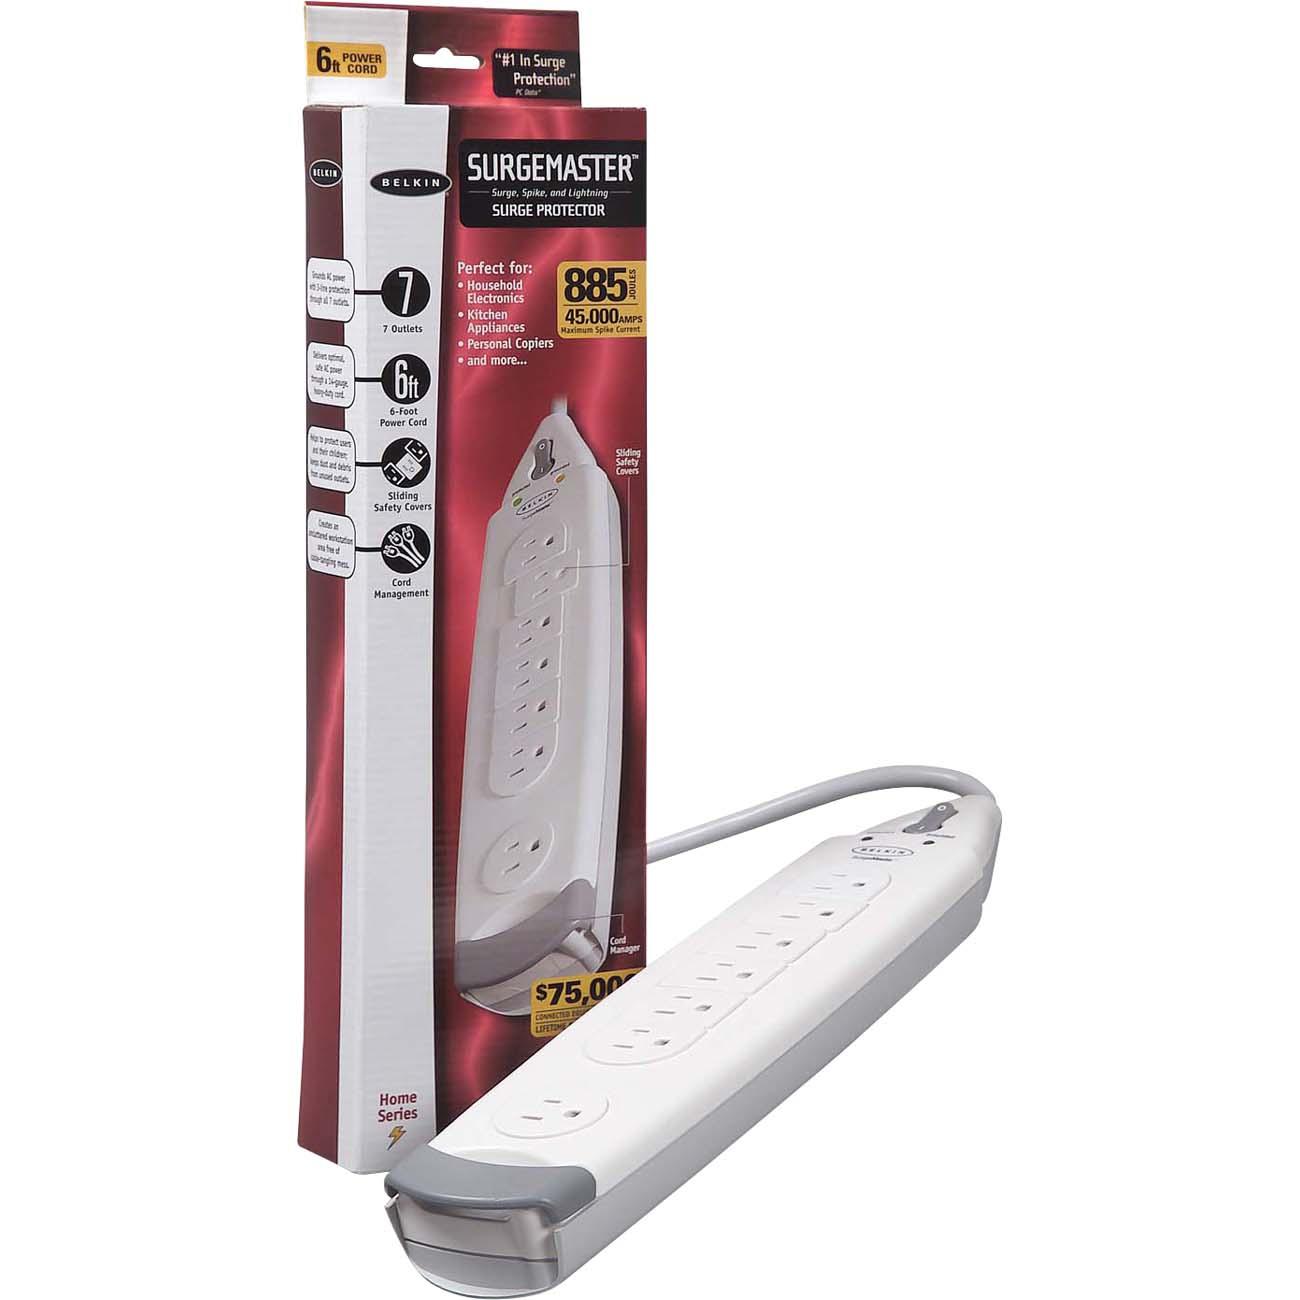 Belkin SurgeMaster Home Series - surge protector